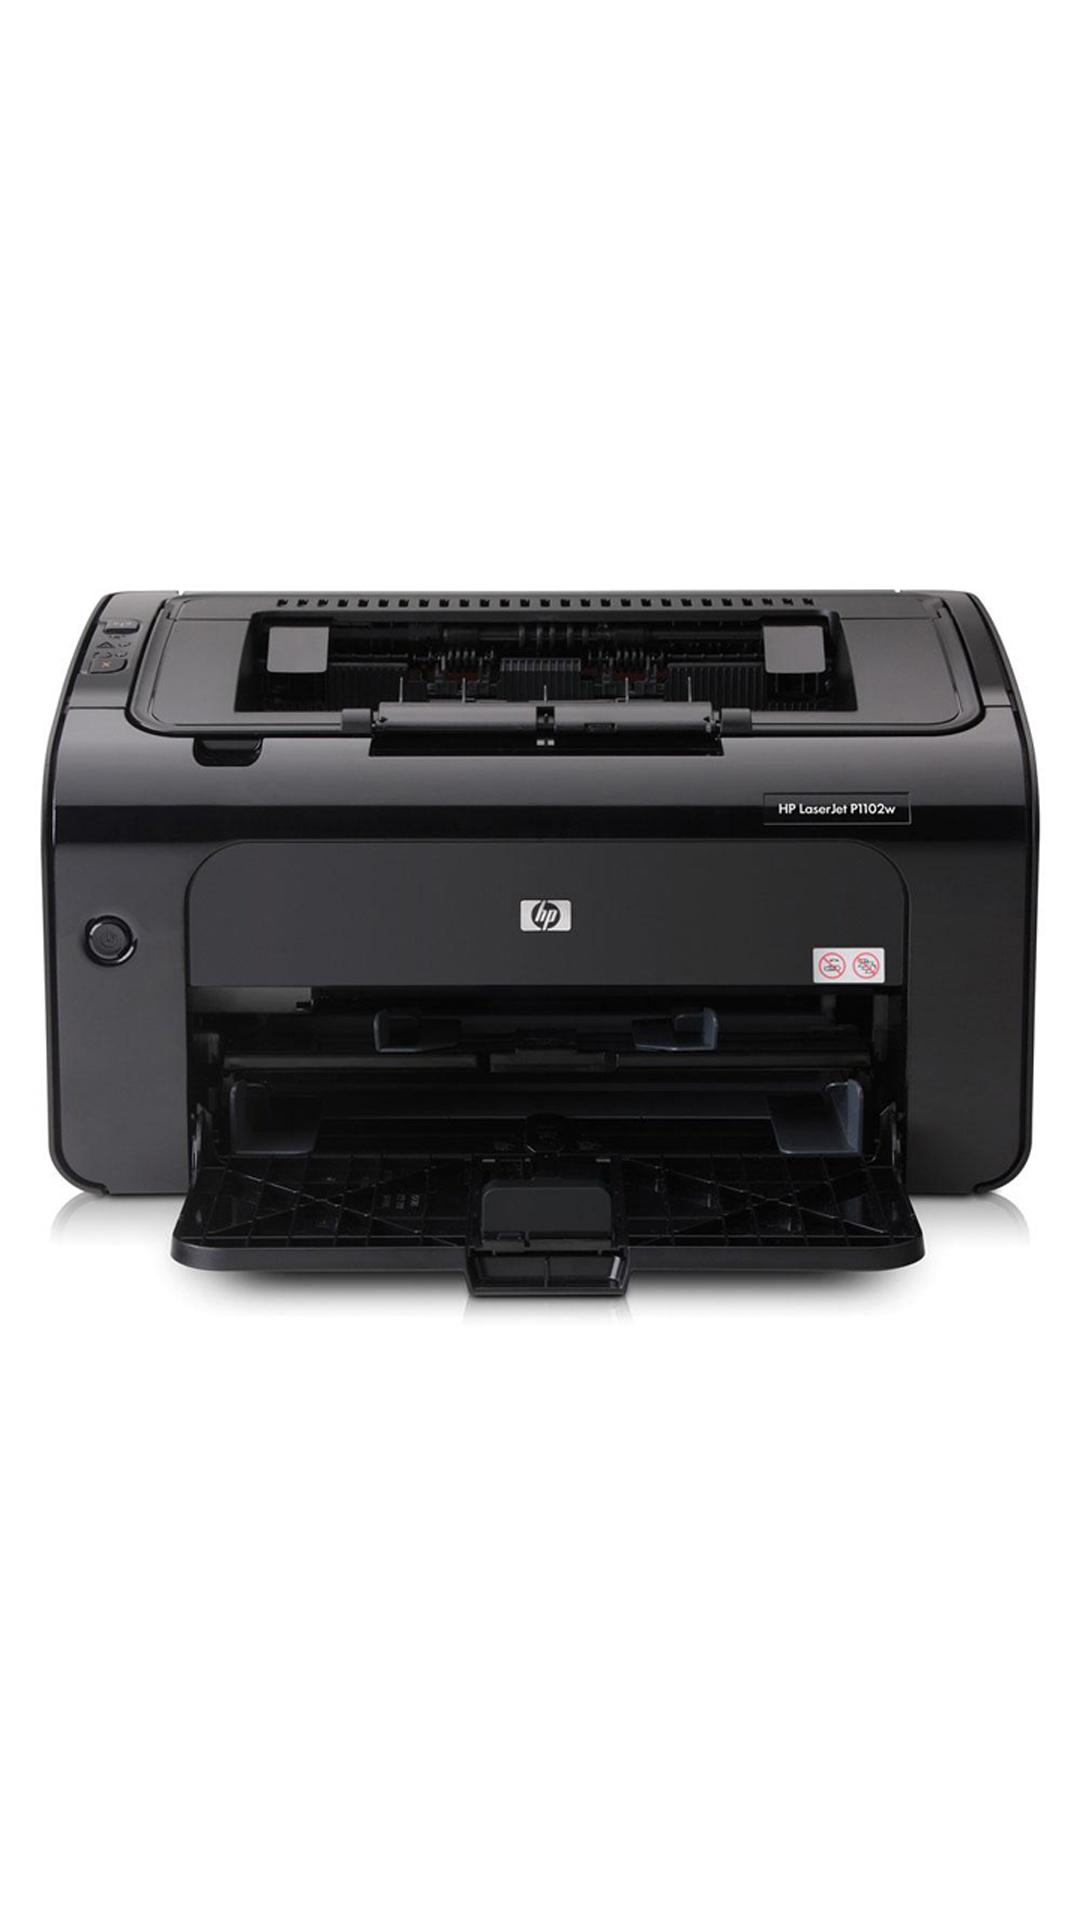 HP LaserJet Pro P1102w Single-Function Laser Printer (Black)